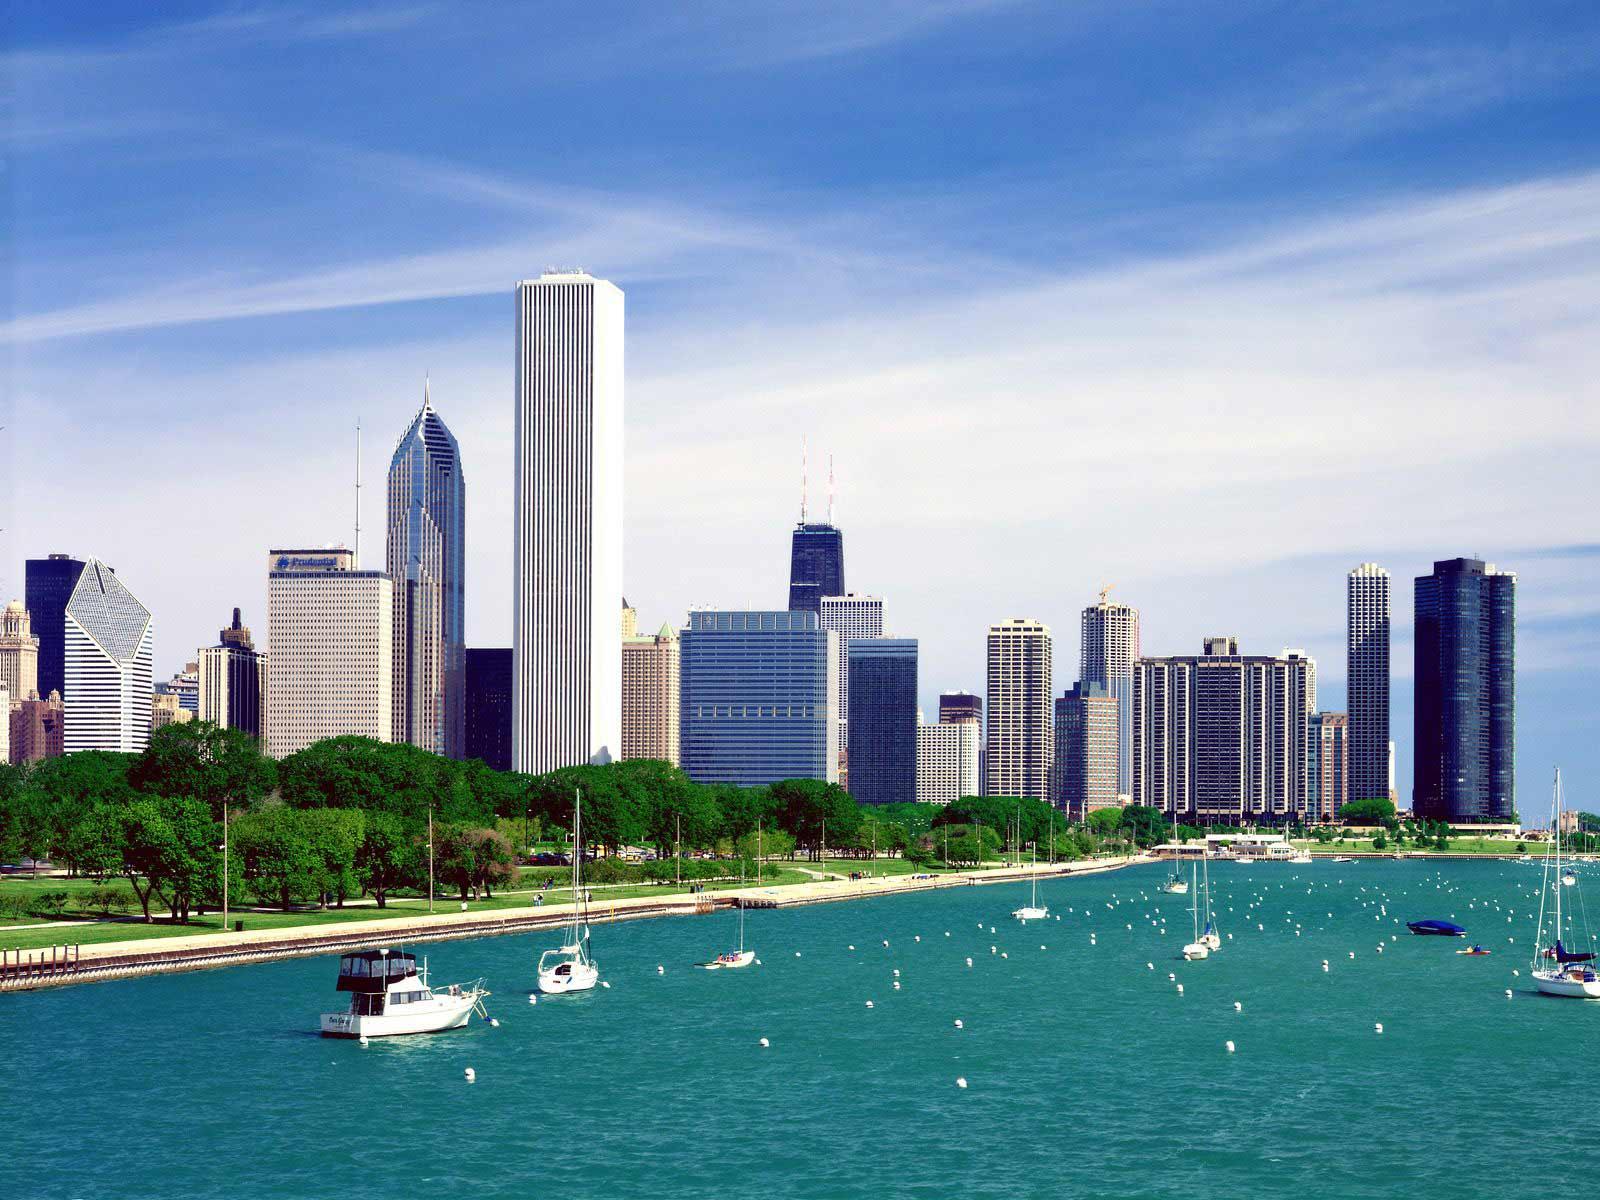 http://1.bp.blogspot.com/-YktSEIll3lc/T1w0UrseXVI/AAAAAAAAEpI/rFCpPRlOntY/s1600/Chicago+Skyline+Hd+Wallpaper+(13).jpg